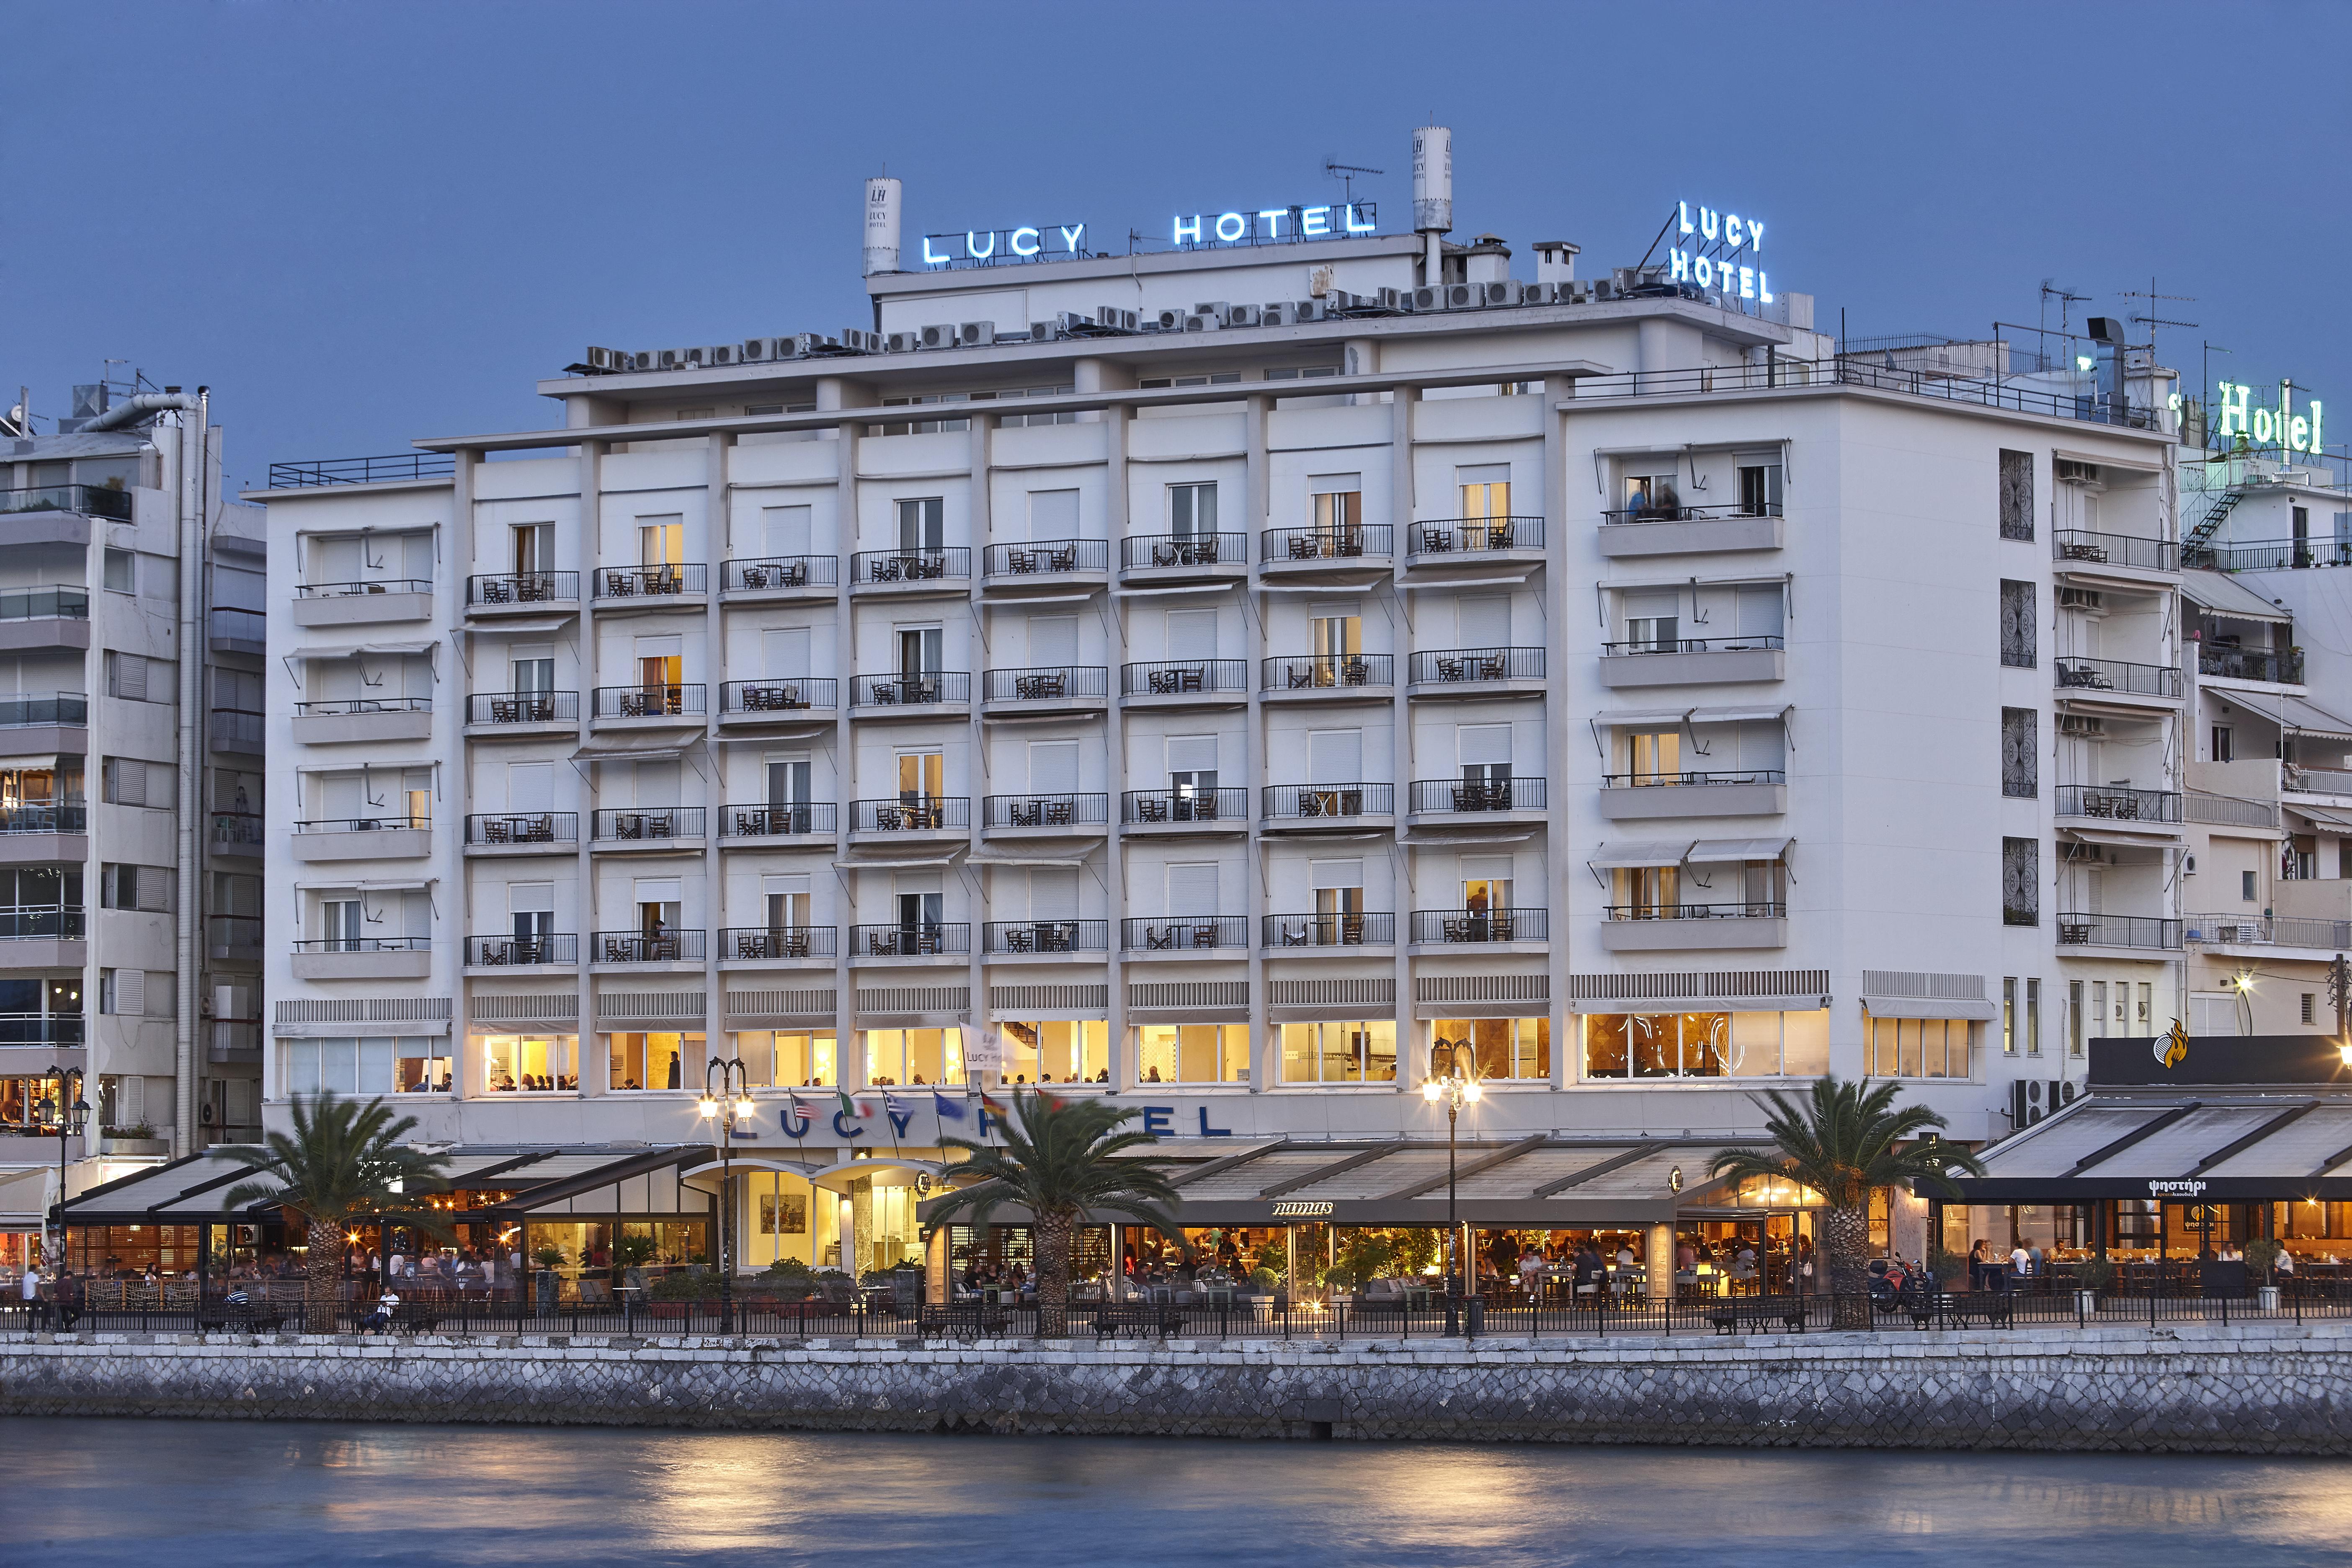 Lucy Hotel - Καλωσορίσατε στην καρδιά της Χαλκίδας, στο κατώφλι της Εύβοιας